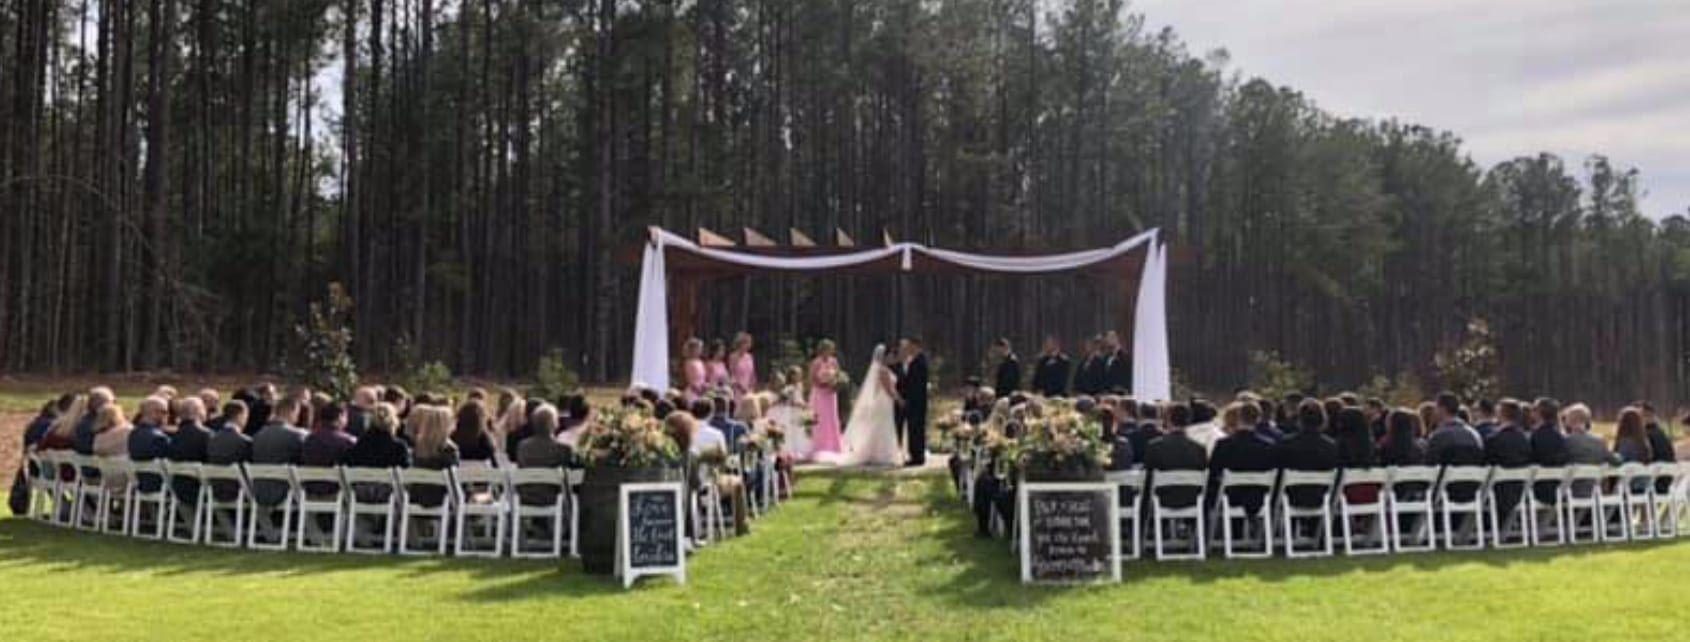 pavilion at carriage farm wedding dj Bunn Dj company